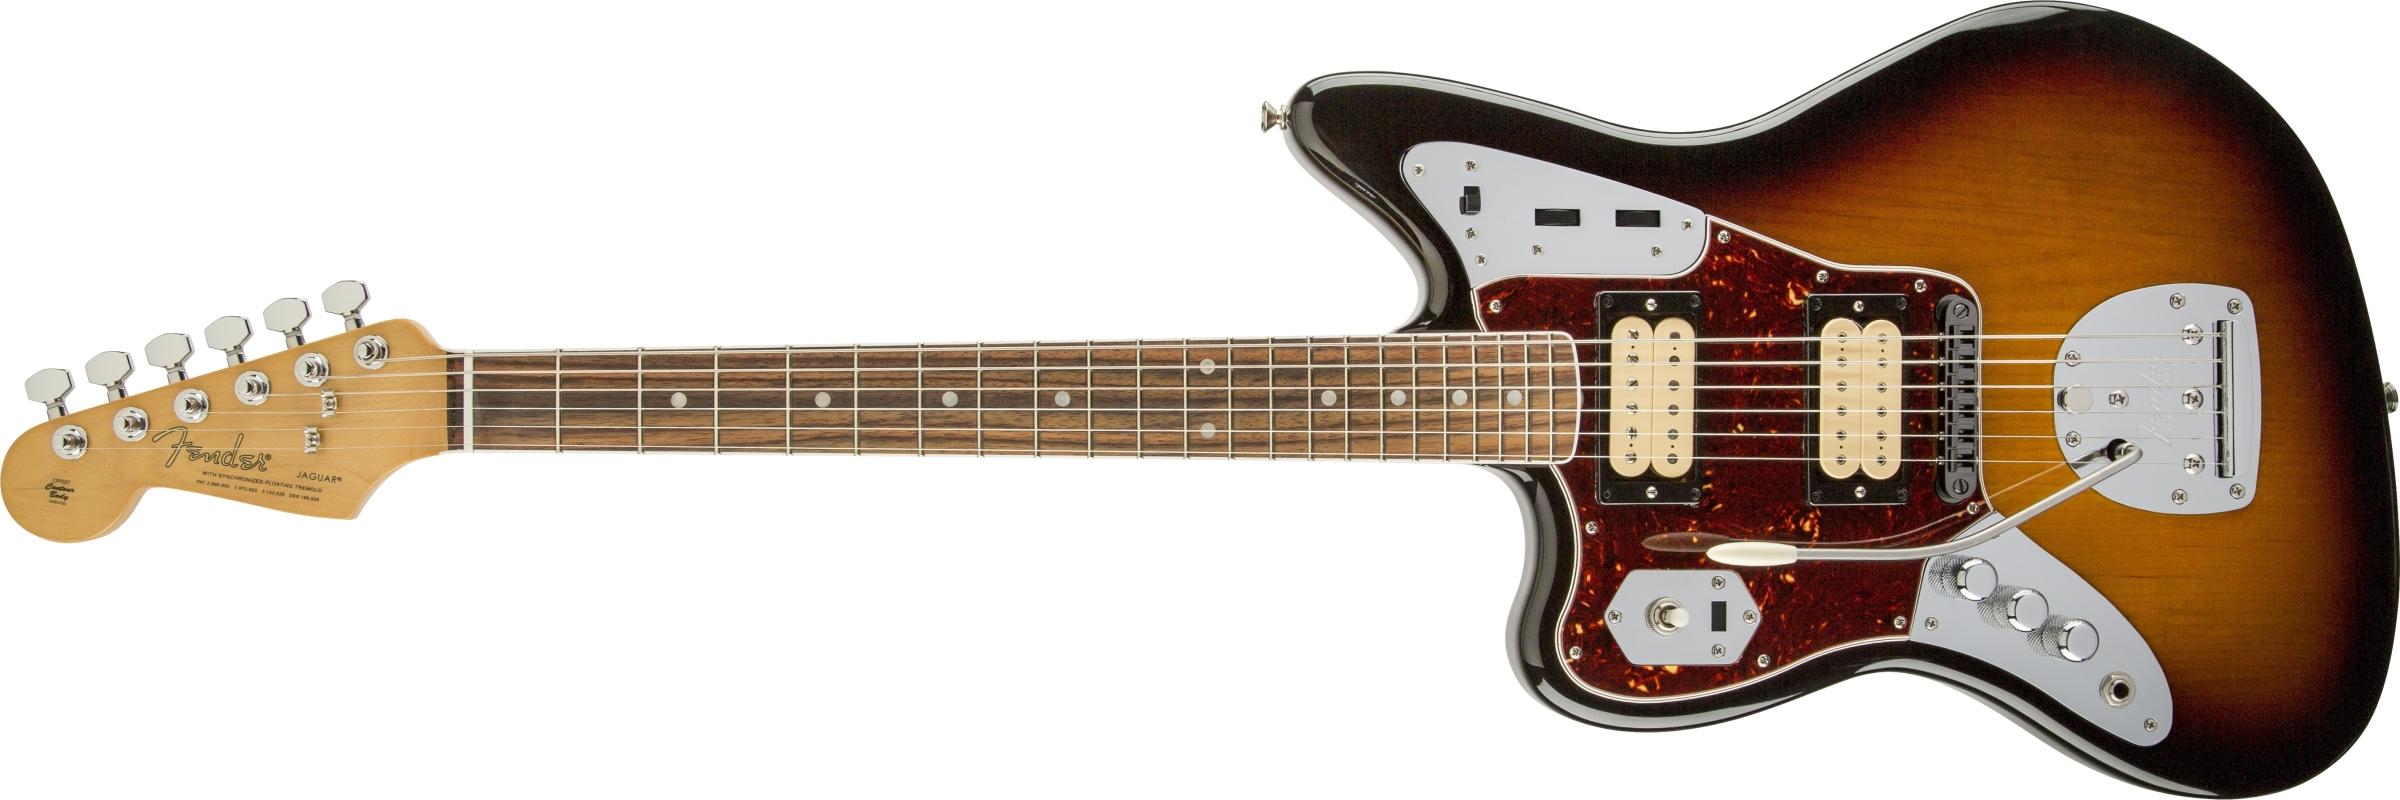 Kurt Cobain Jaguar 174 Left Hand Fender Electric Guitars